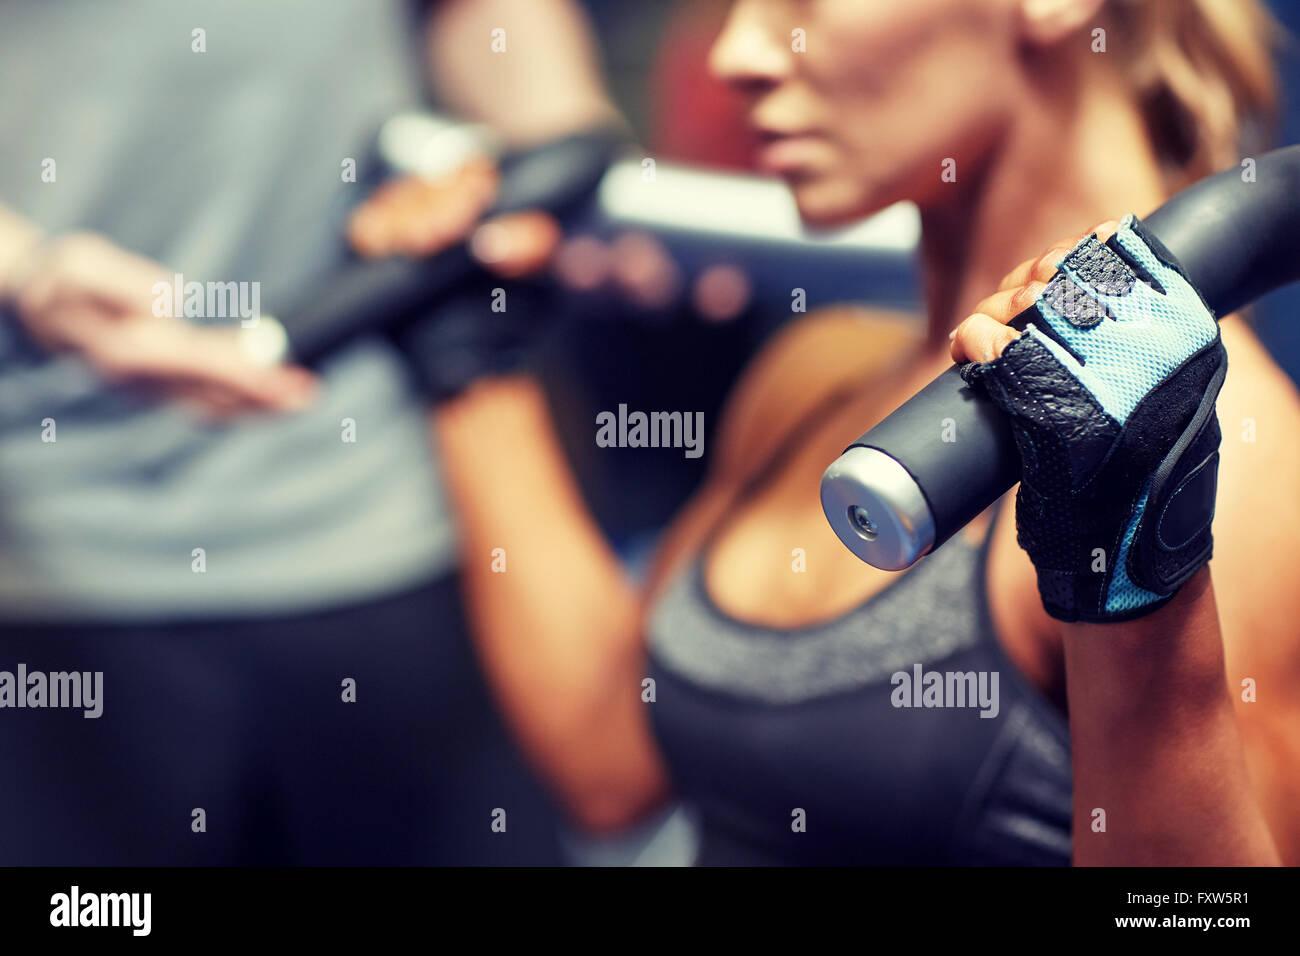 Mann und Frau Muskeln im Fitness-Studio-Maschine Stockbild